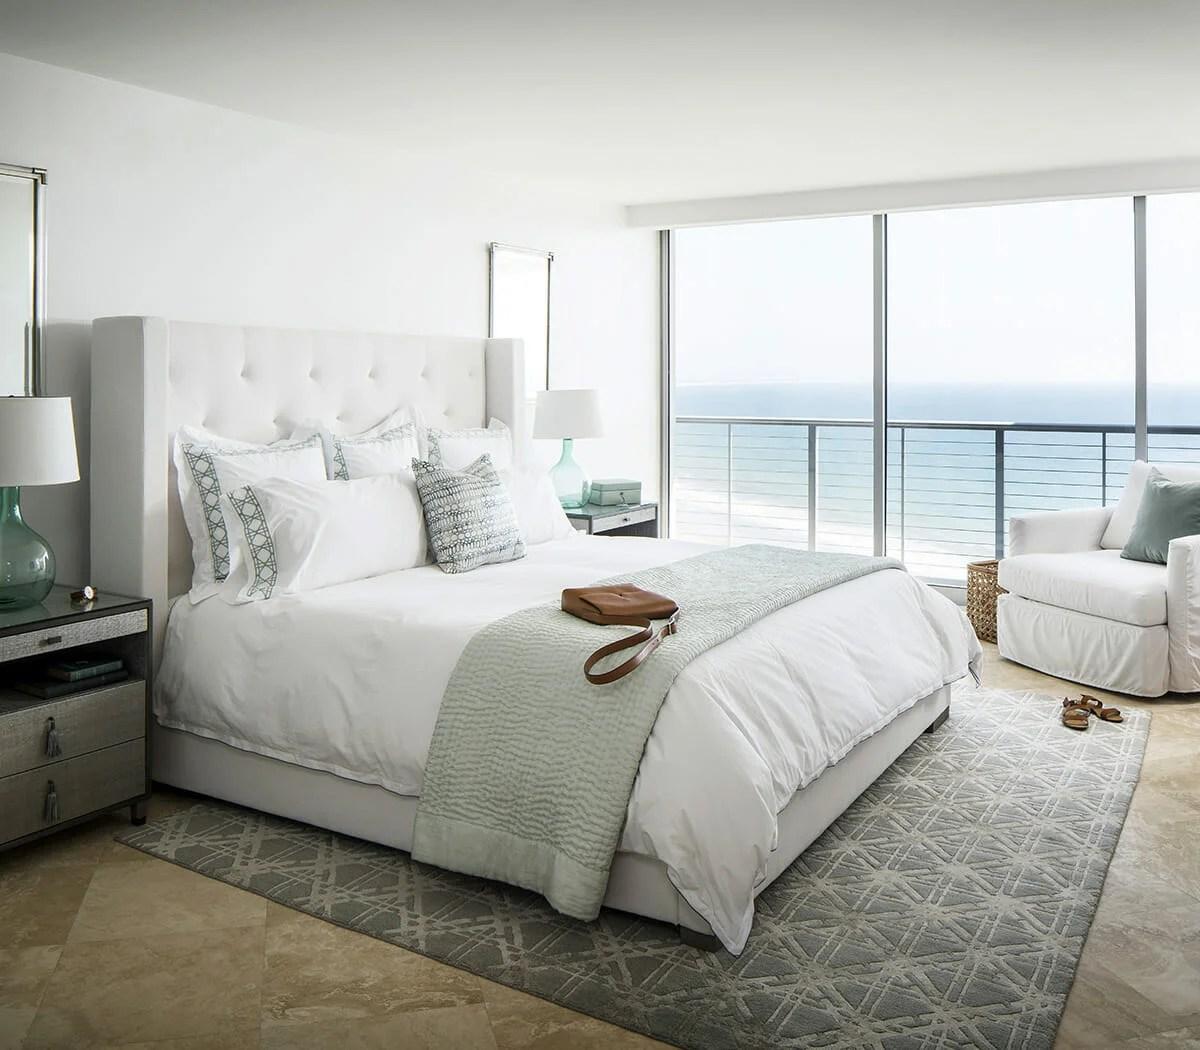 top 10 feng shui bedroom ideas to get a